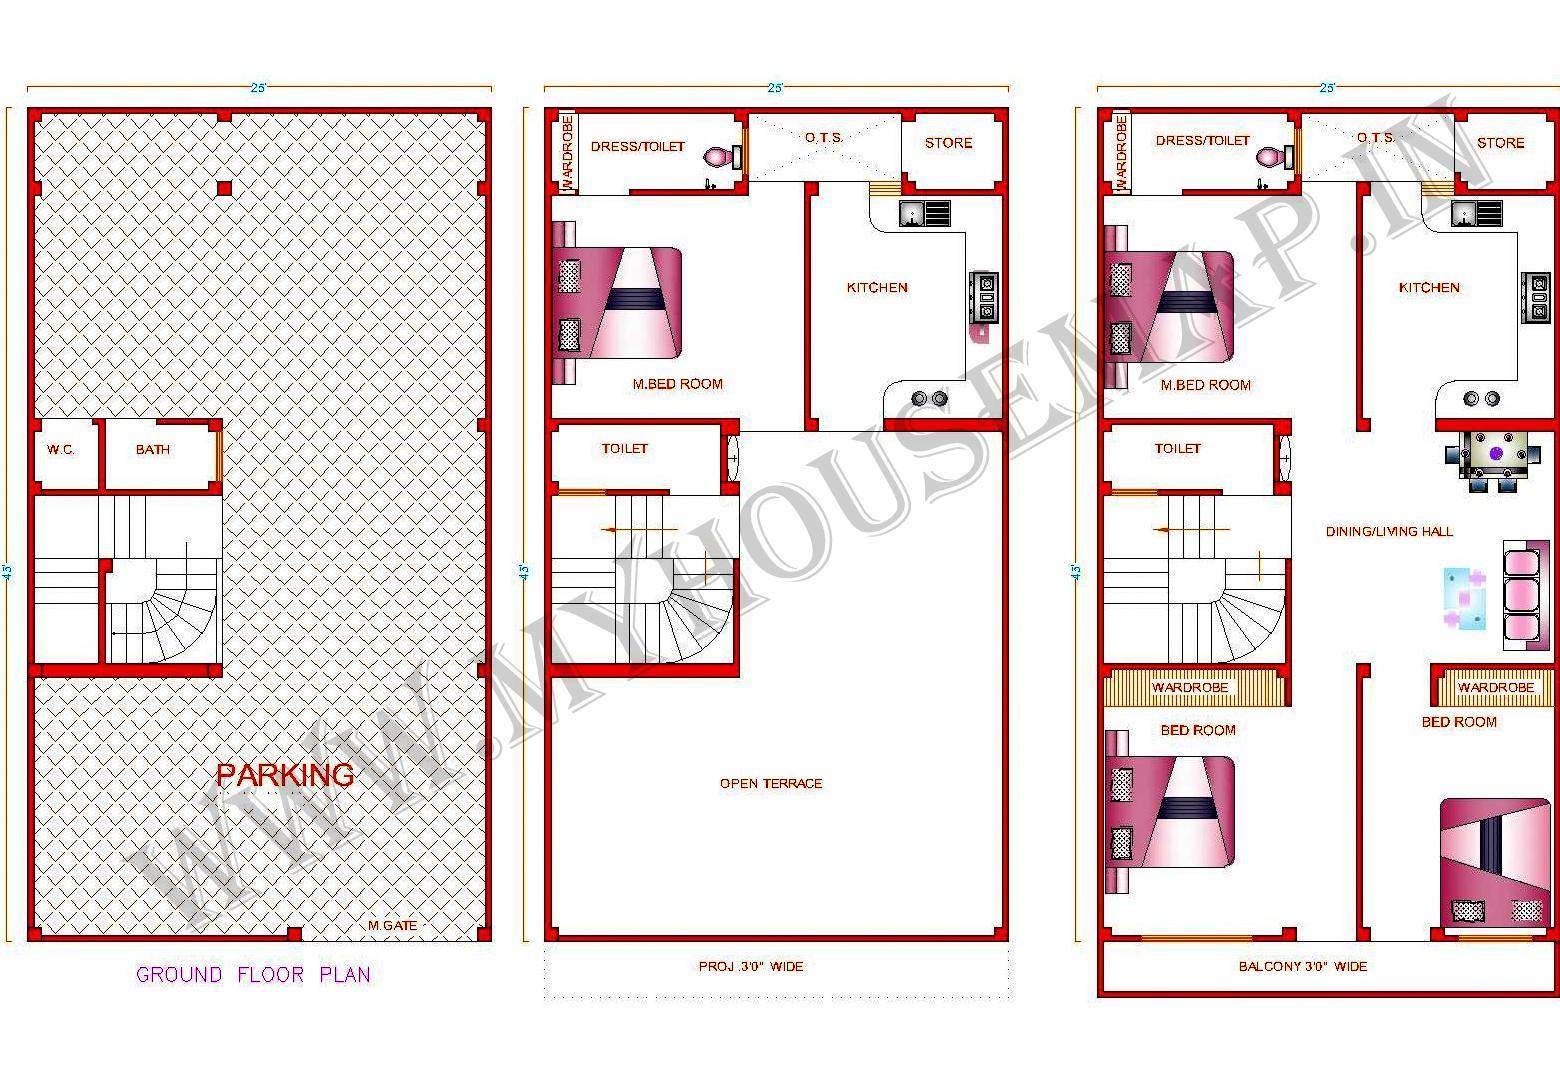 House Map Design Sample Elevation Exterior Home Plans Home Plans Blueprints 97144